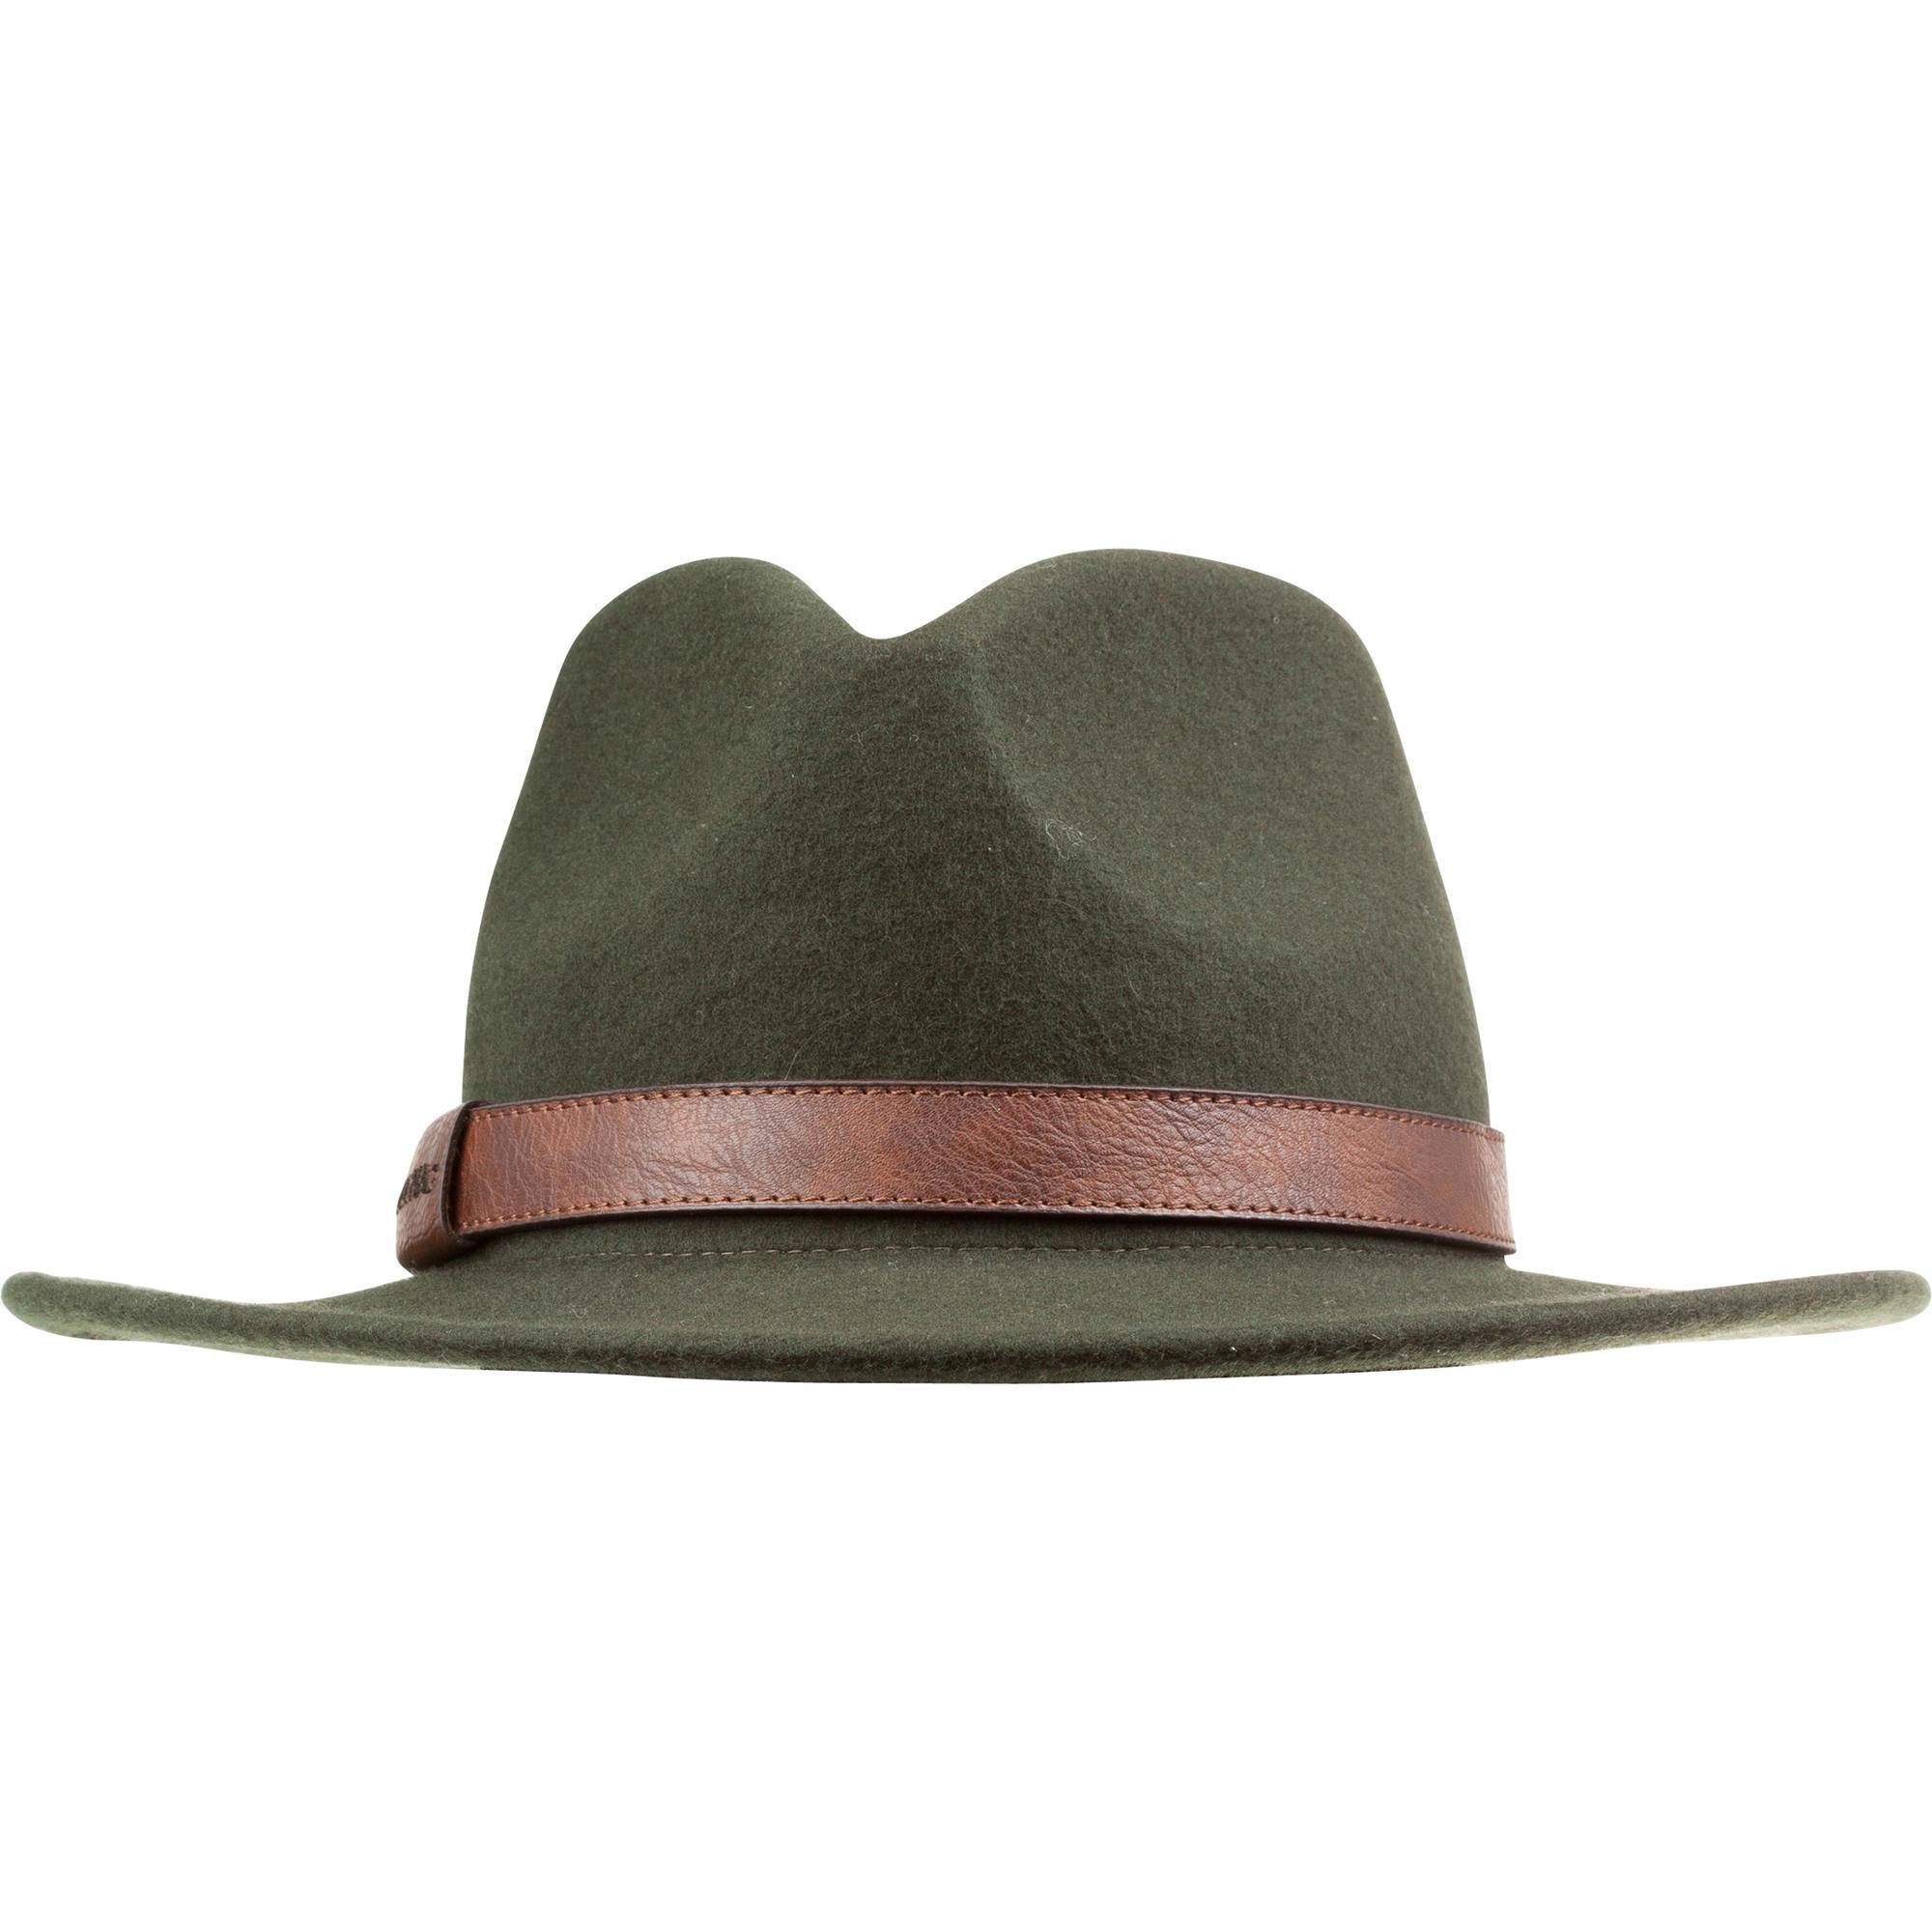 d0fd207a Comprar Sombreros para Deporte | Decathlon